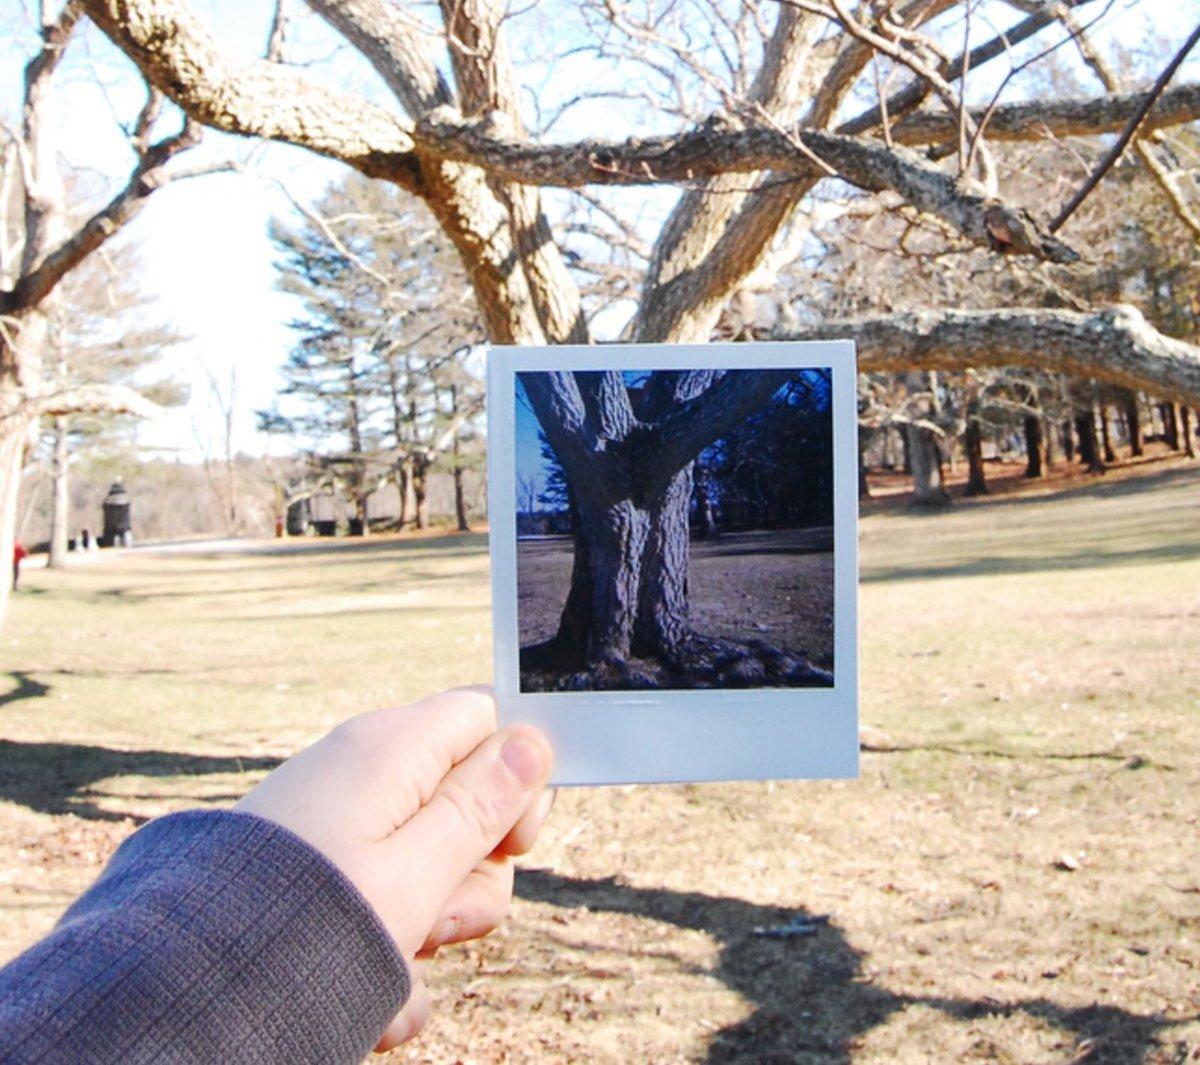 Share all your Polaroid pics here: https://t.co/ABCWFuzTHH https://t.co/vzsvhubv4U